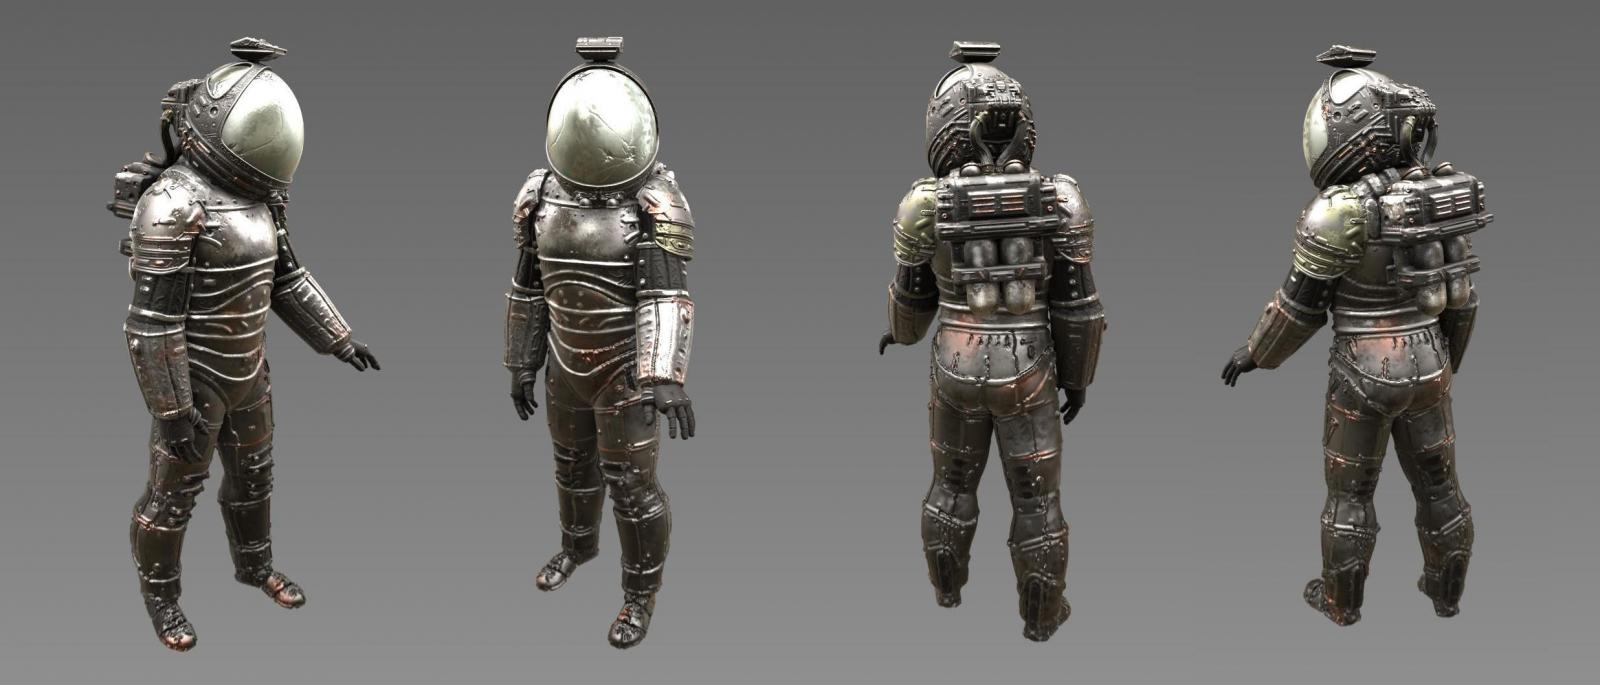 Astronaut's findings